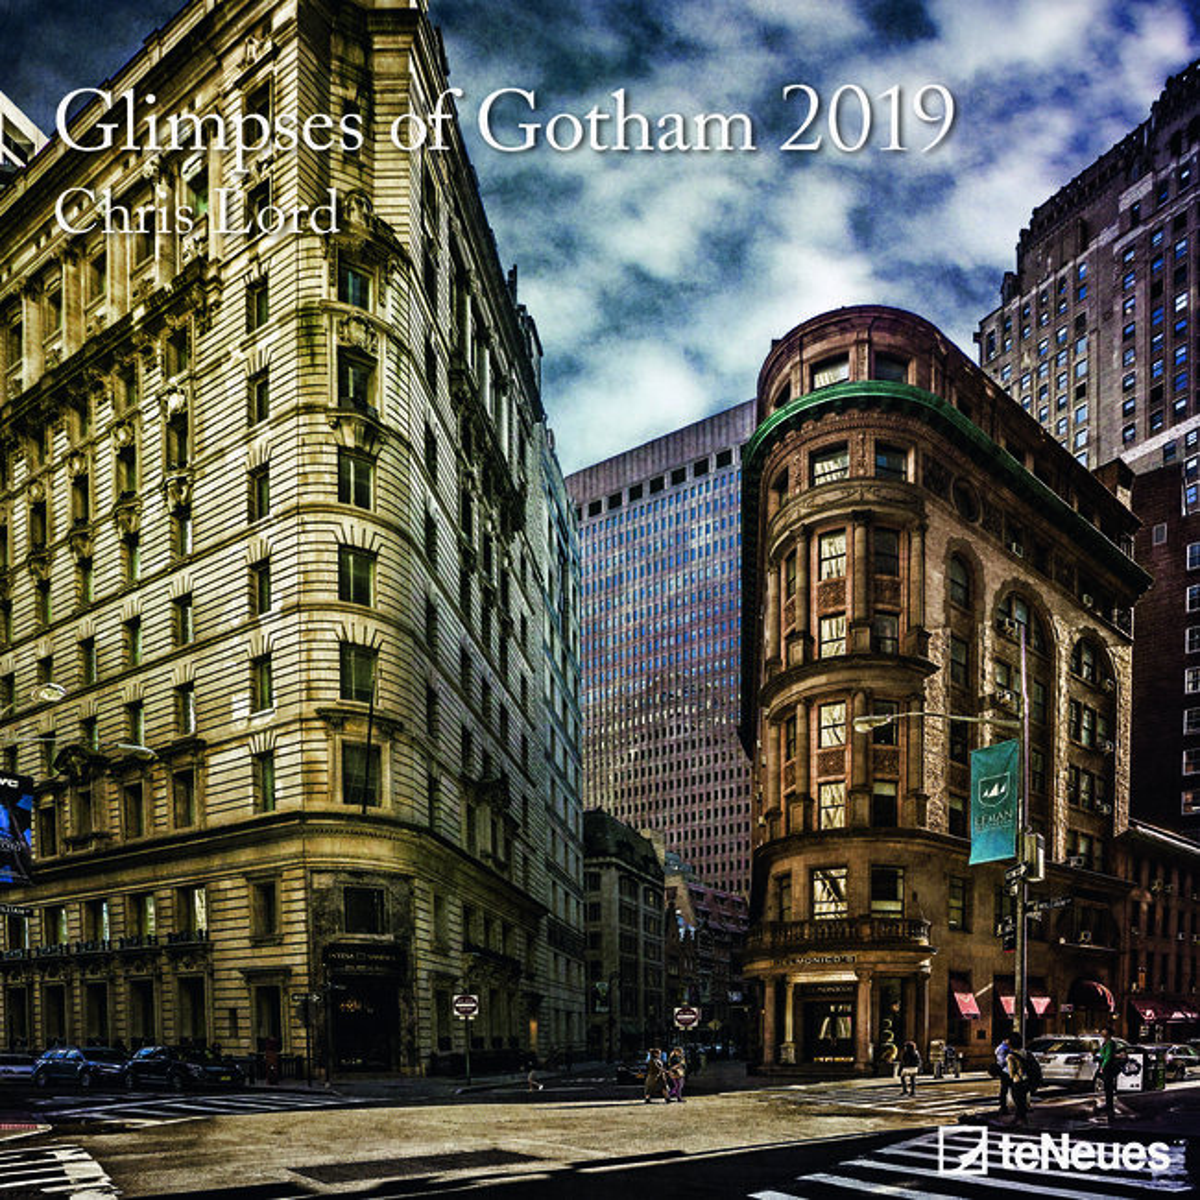 Calendrier Gotham.Calendrier 2019 Gotham Chris Lord